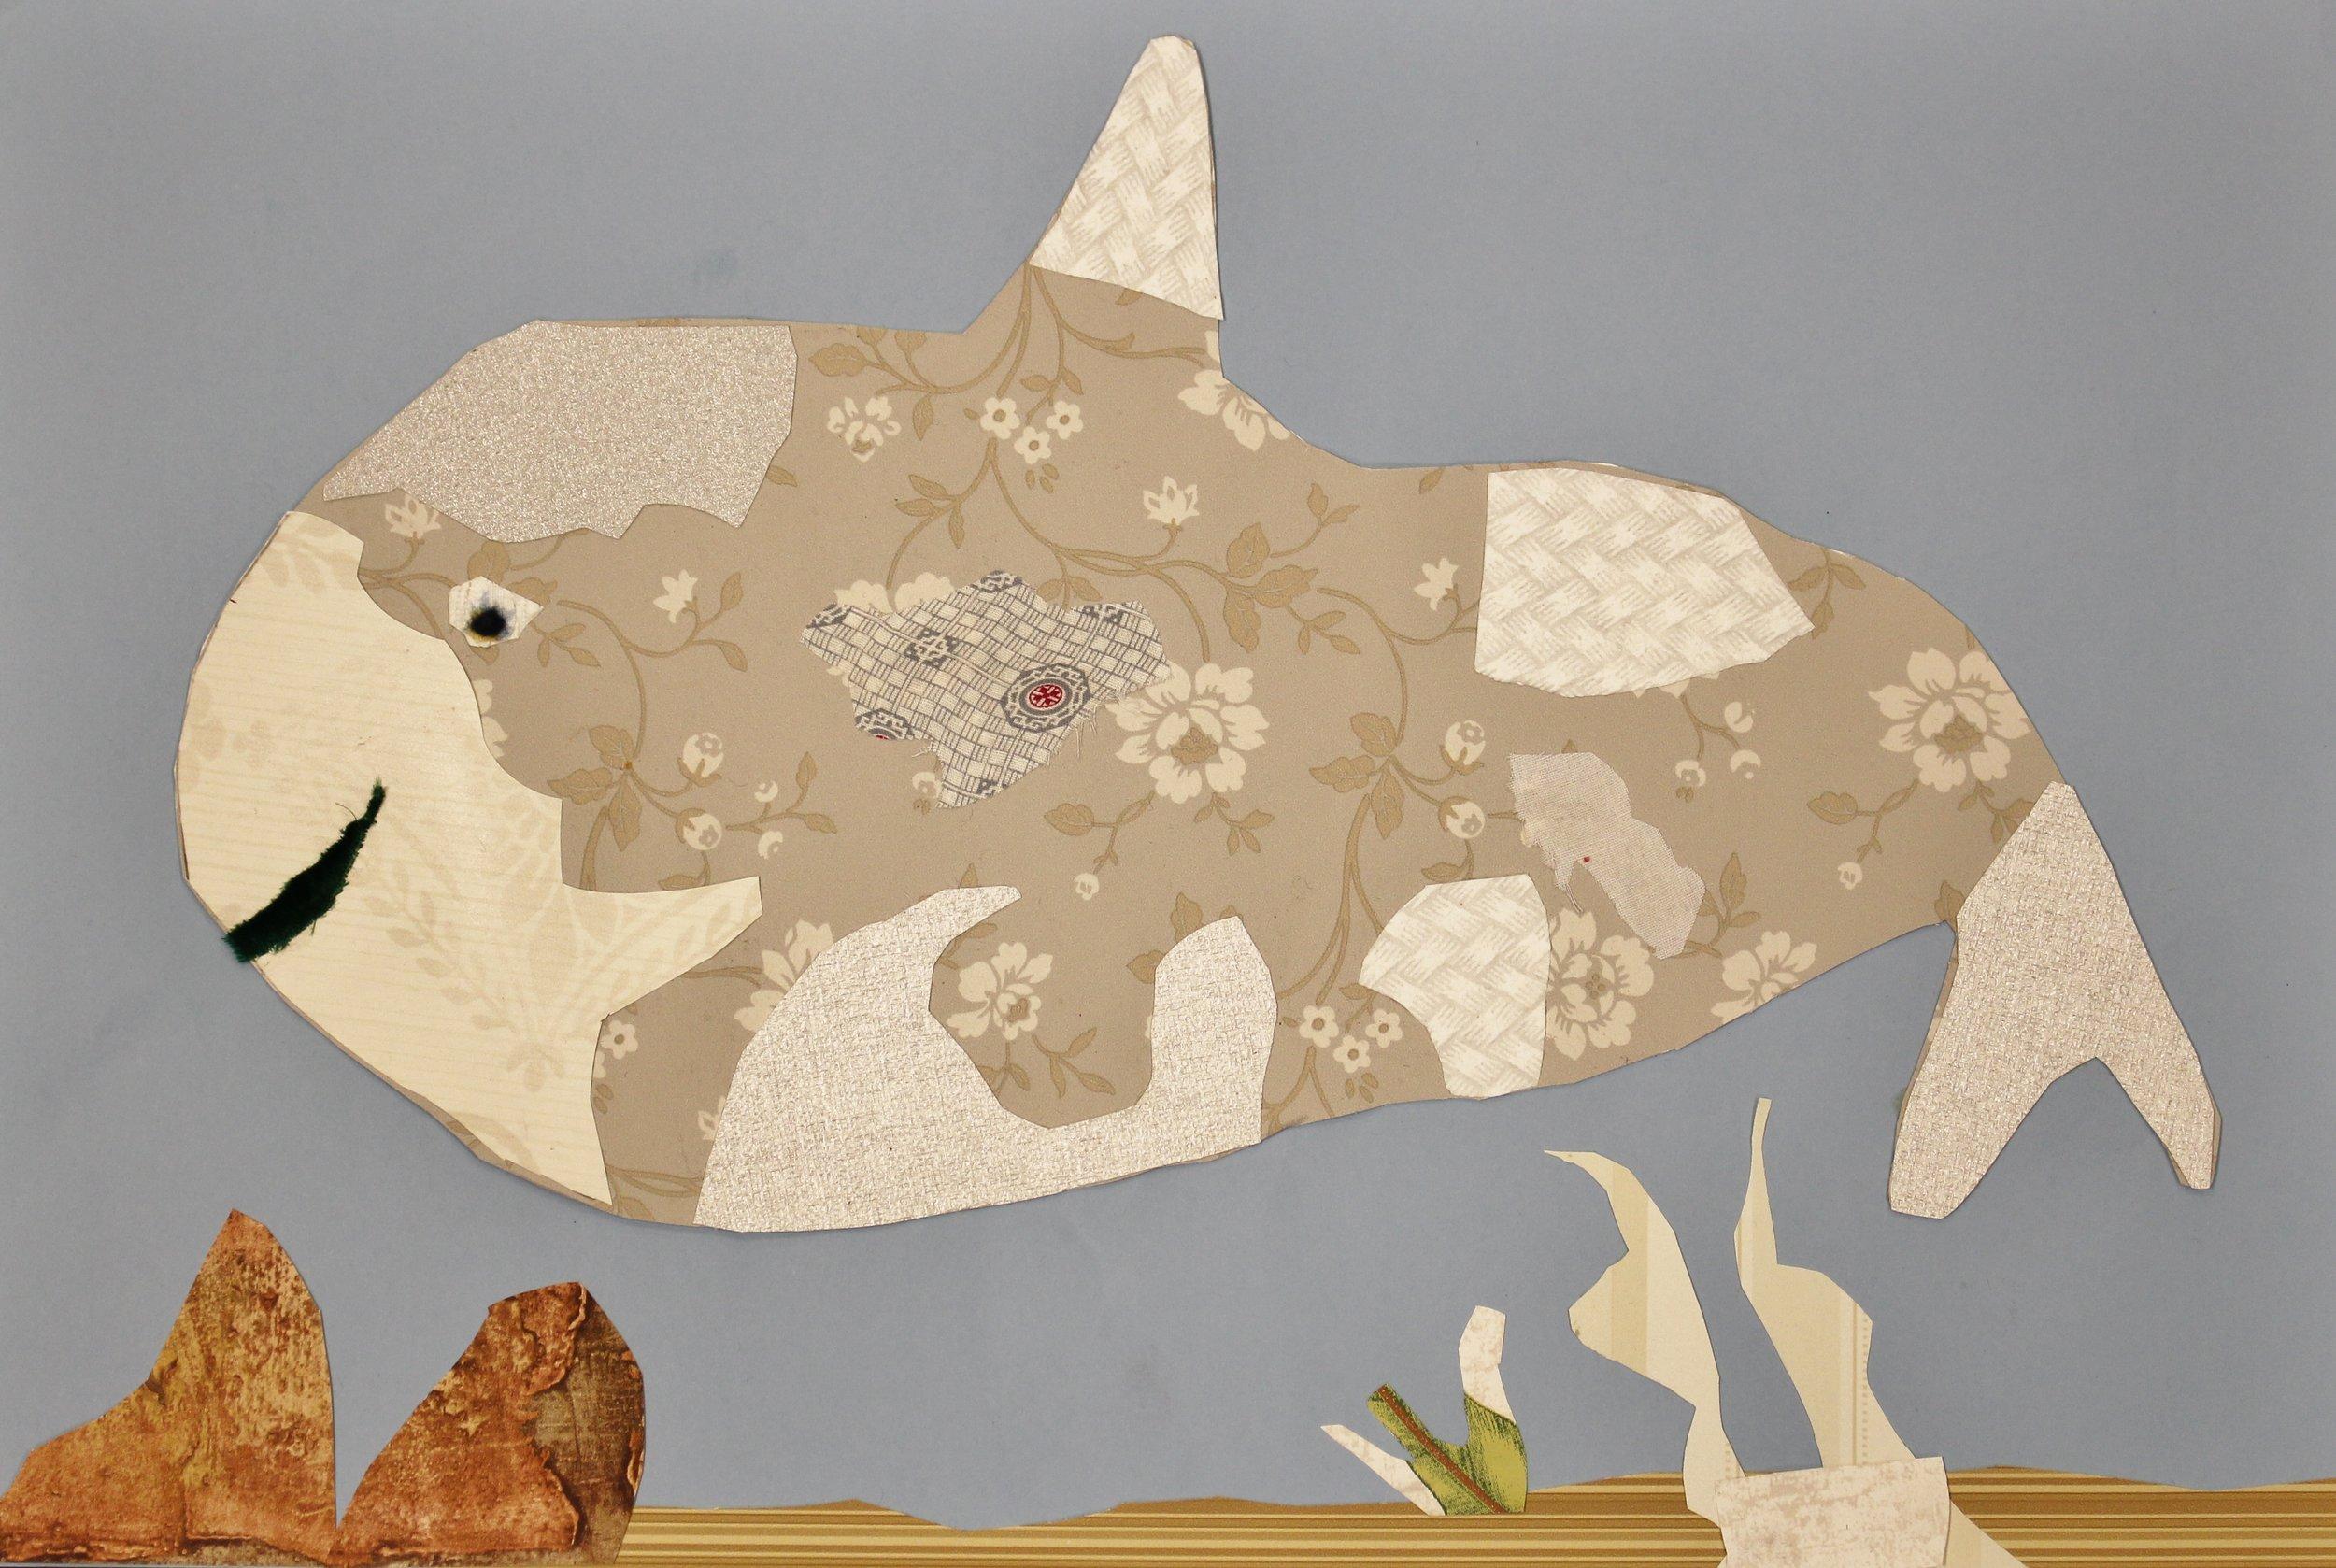 4th Grade: Grace Adams (Michel Keck Collage Animal)